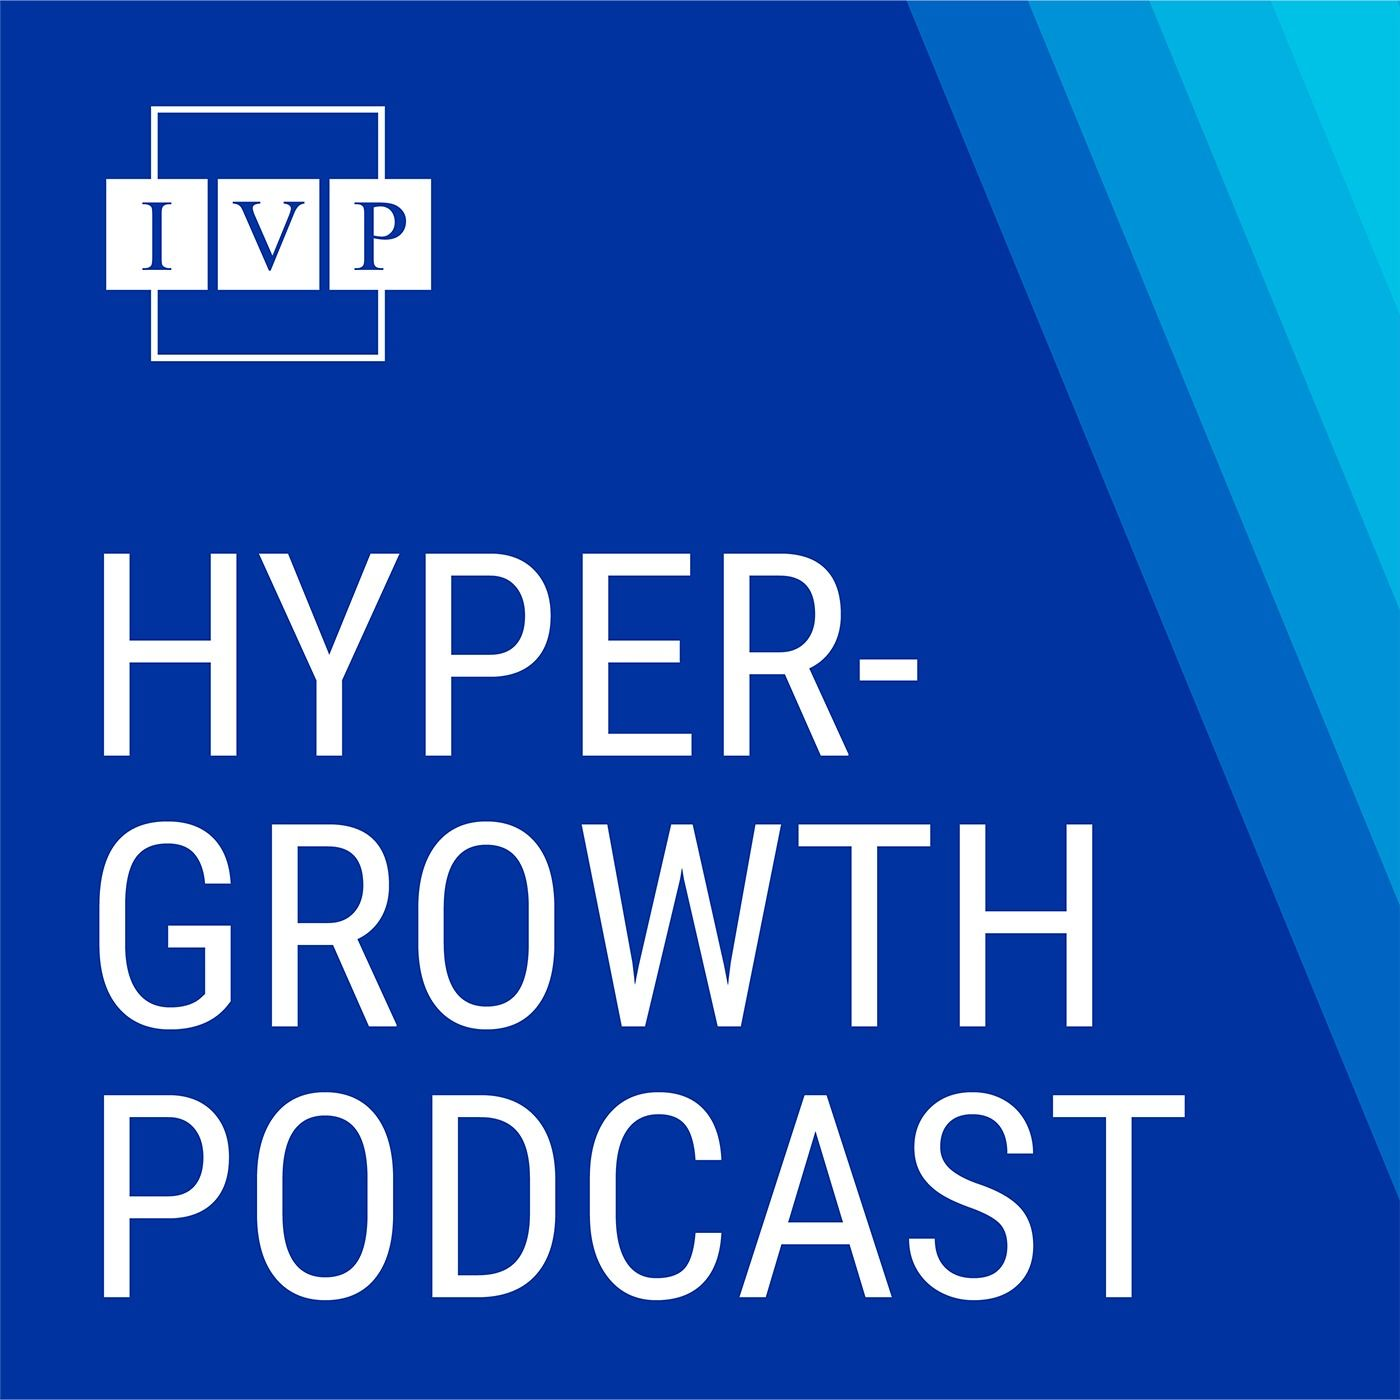 IVP's Hyper-Growth Podcast